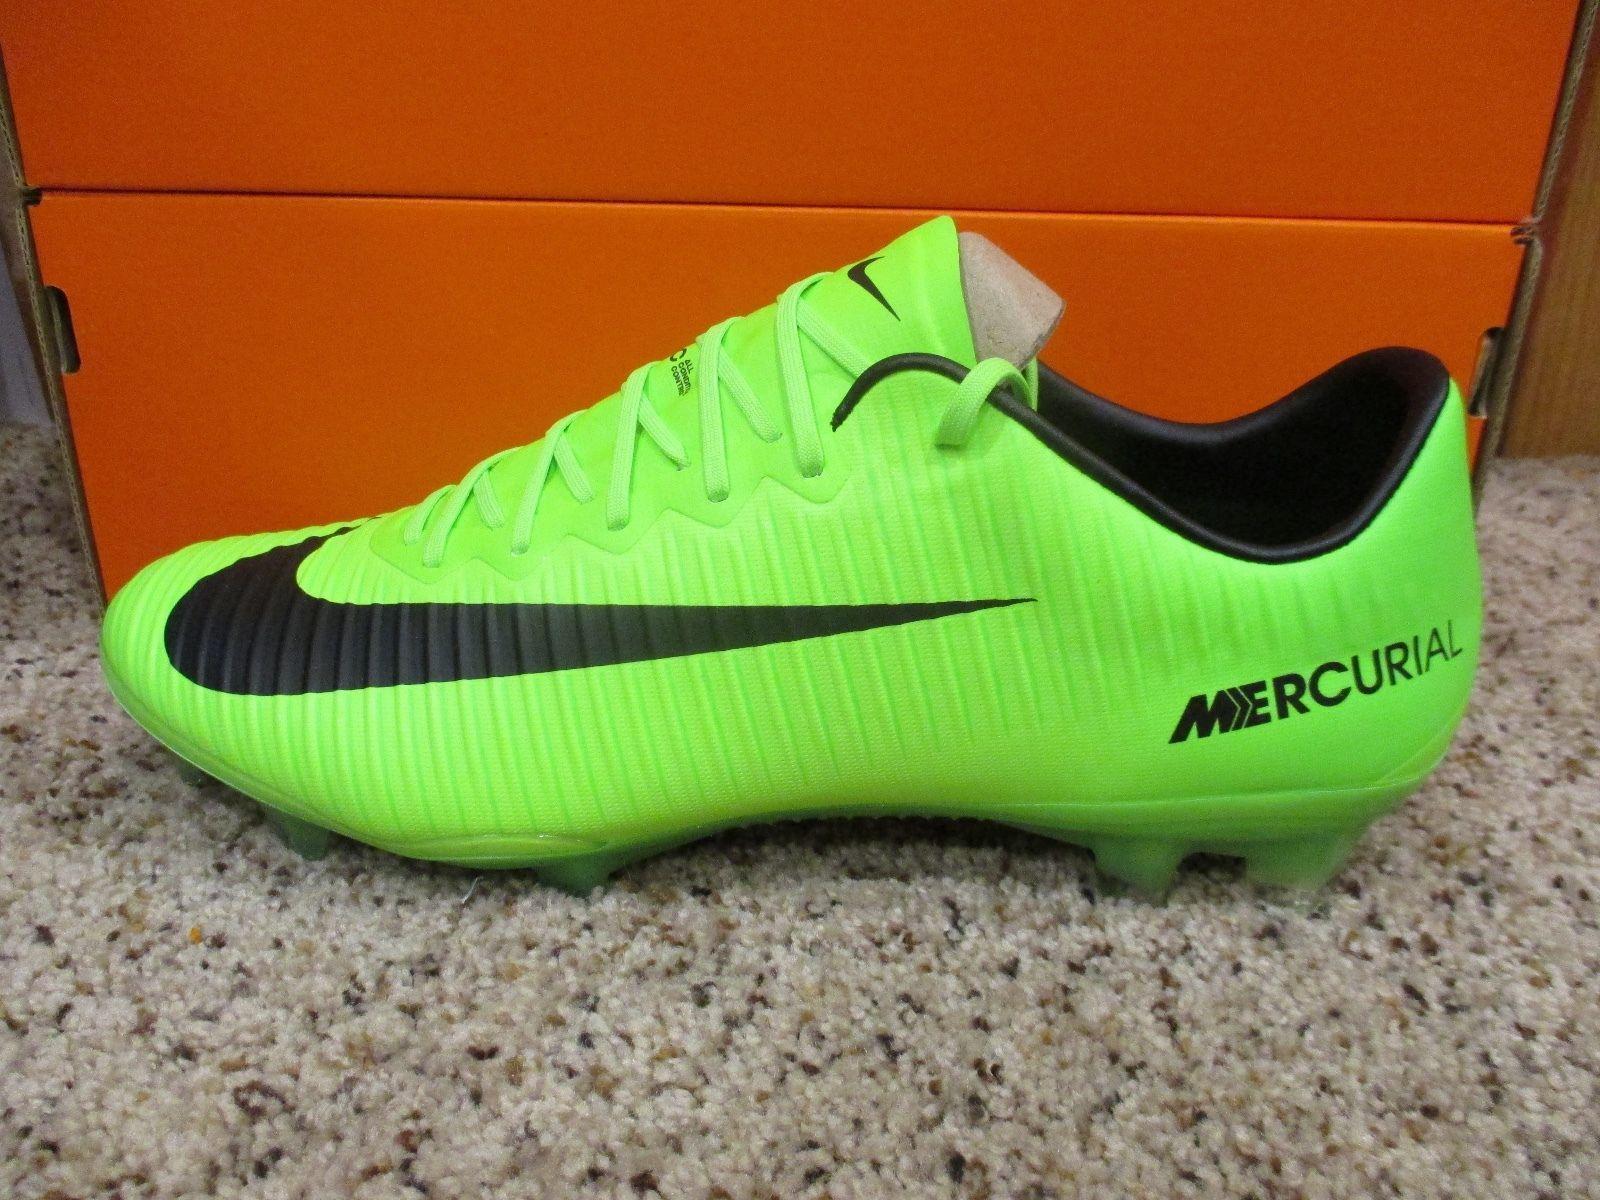 Nike Mens Mercurial Vapor XI FG Soccer Cleats (Electric Green/Black) 831958-